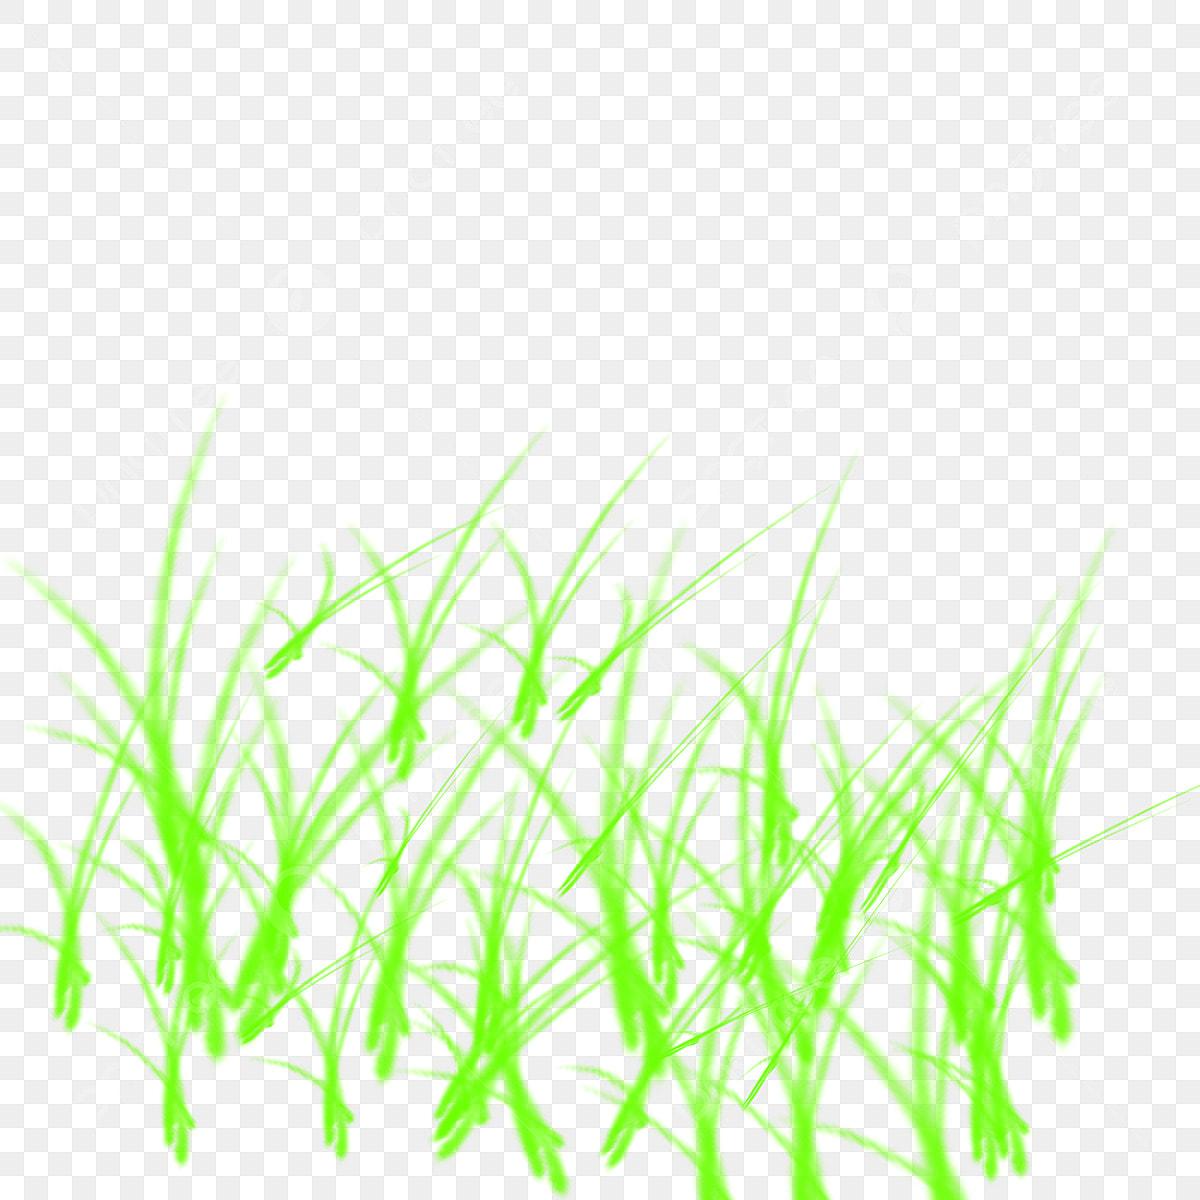 Grass Texture Background, Grass Png Texture, Grass Png For Photoshop